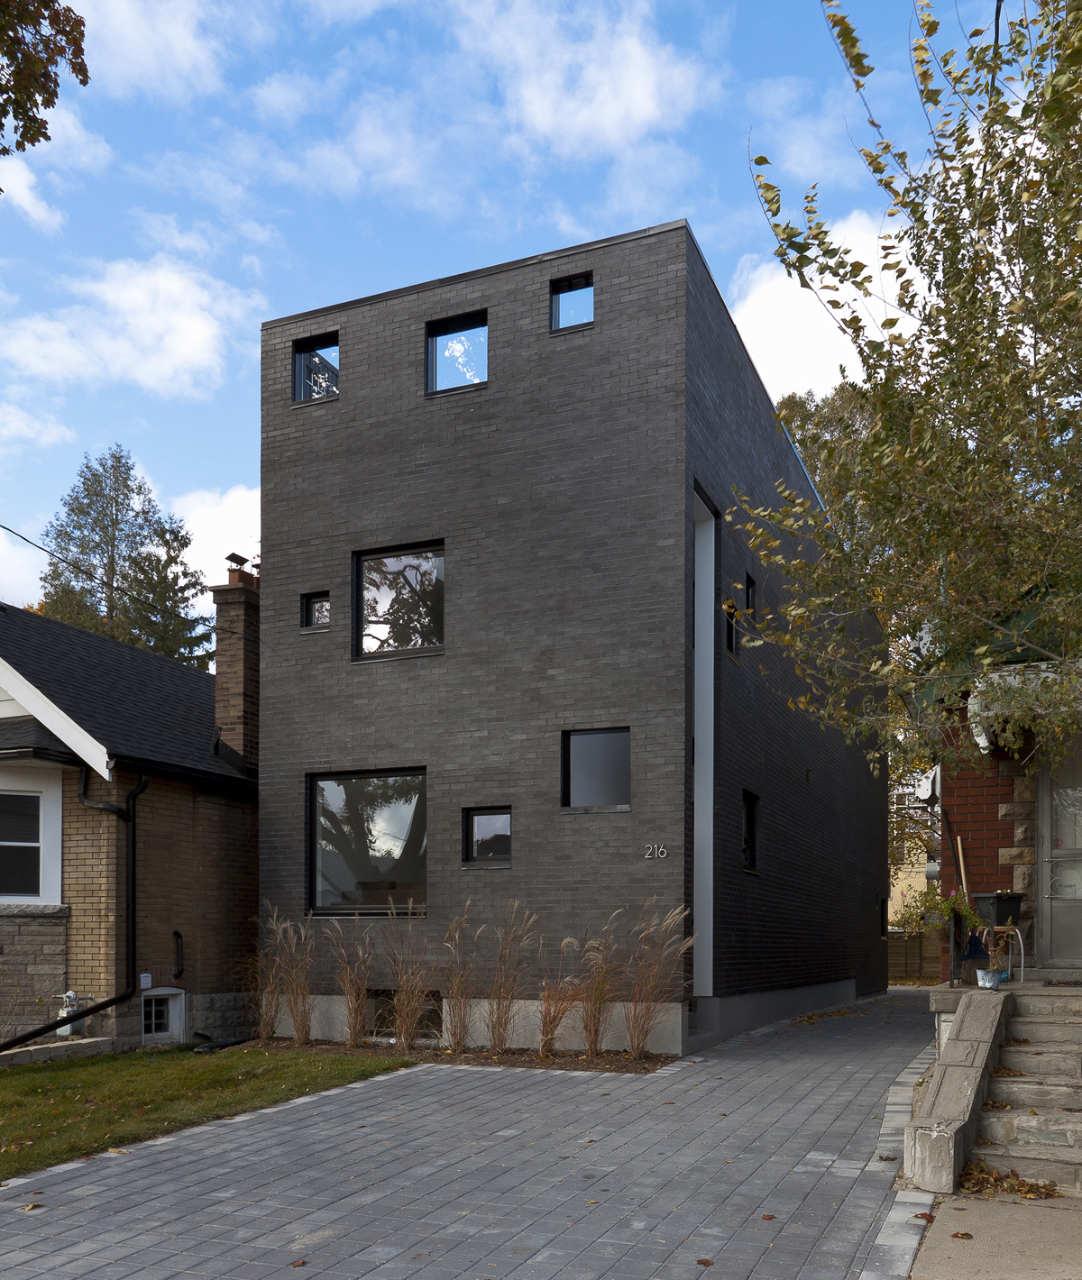 Charcoal House / Atelier rzlbd, © borXu Design